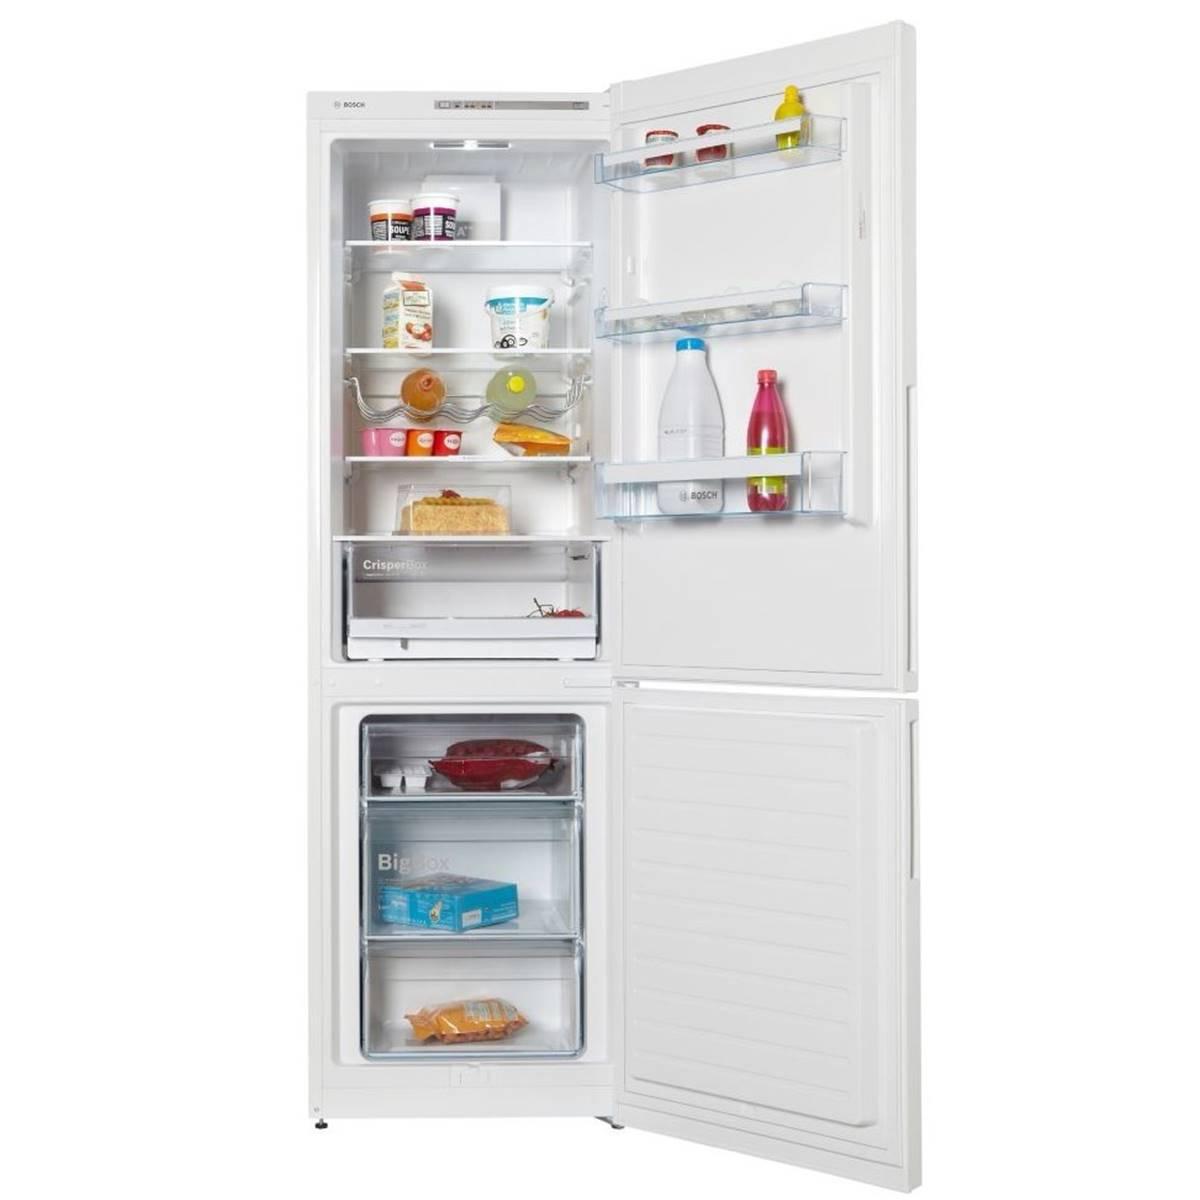 refrigerateur combine bosch kgv36vw32s. Black Bedroom Furniture Sets. Home Design Ideas